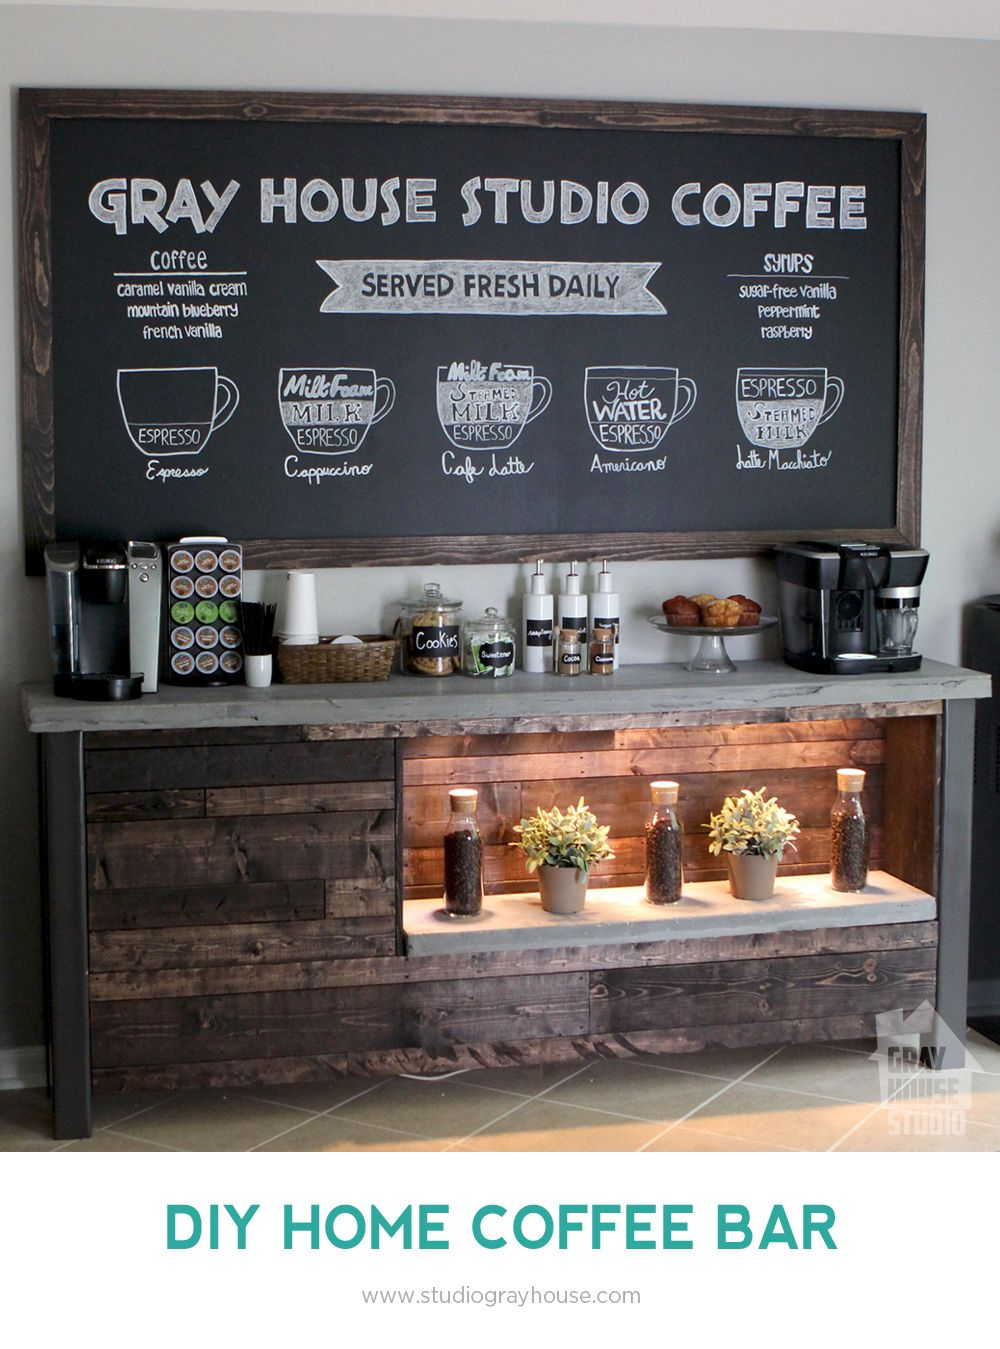 diy coffee bar diy ideas coffee bar home coffee bar. Black Bedroom Furniture Sets. Home Design Ideas